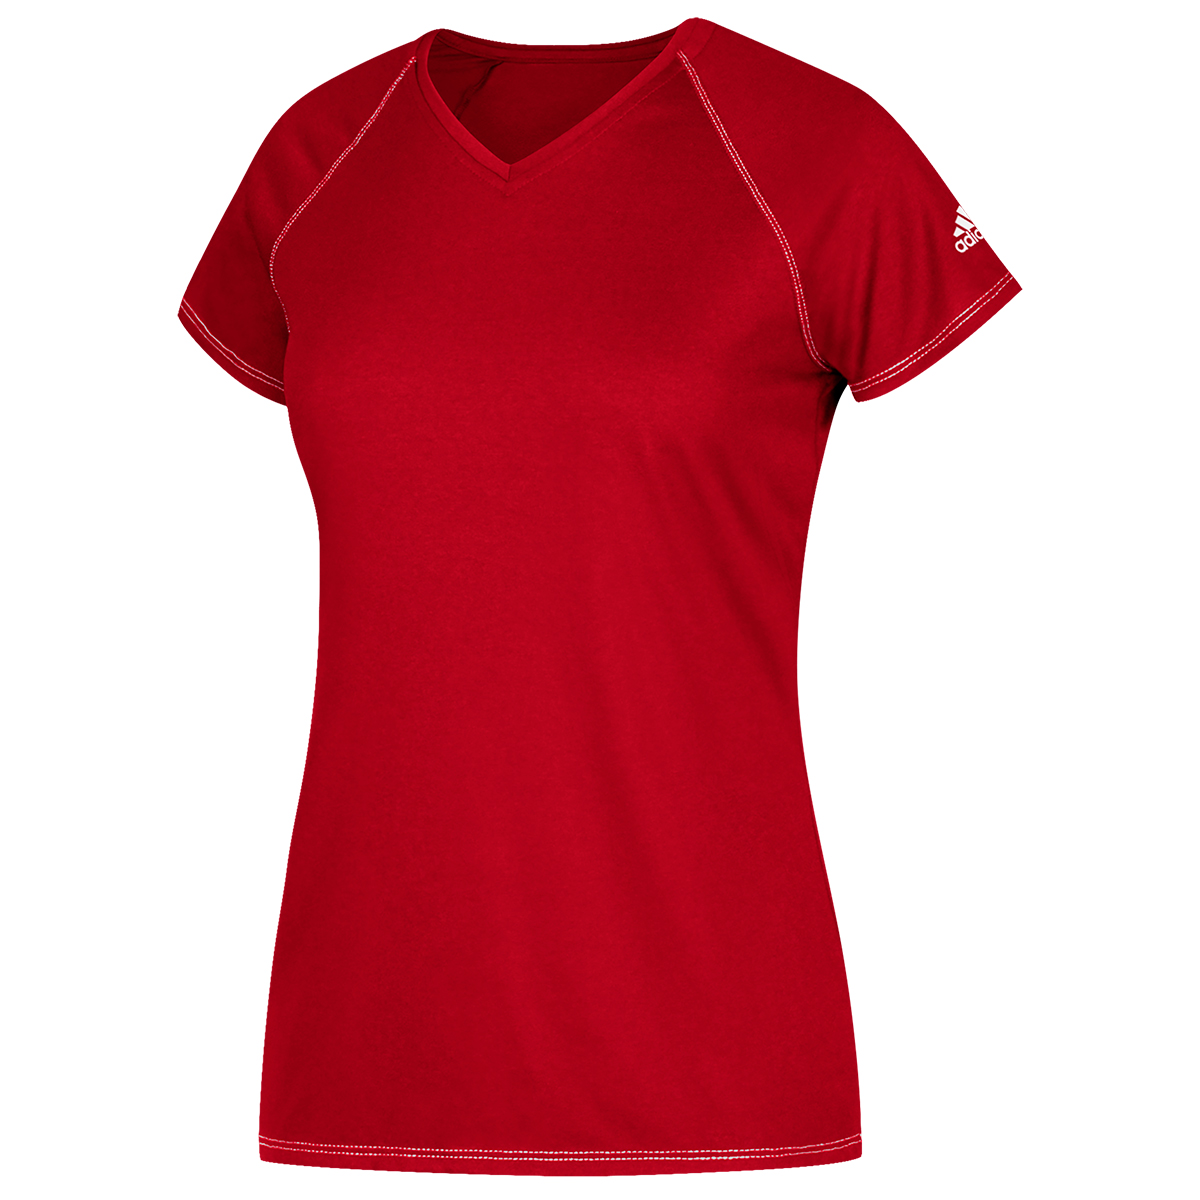 Adidas Women's Short-Sleeve Team Climalite Tee - Red, 3XL